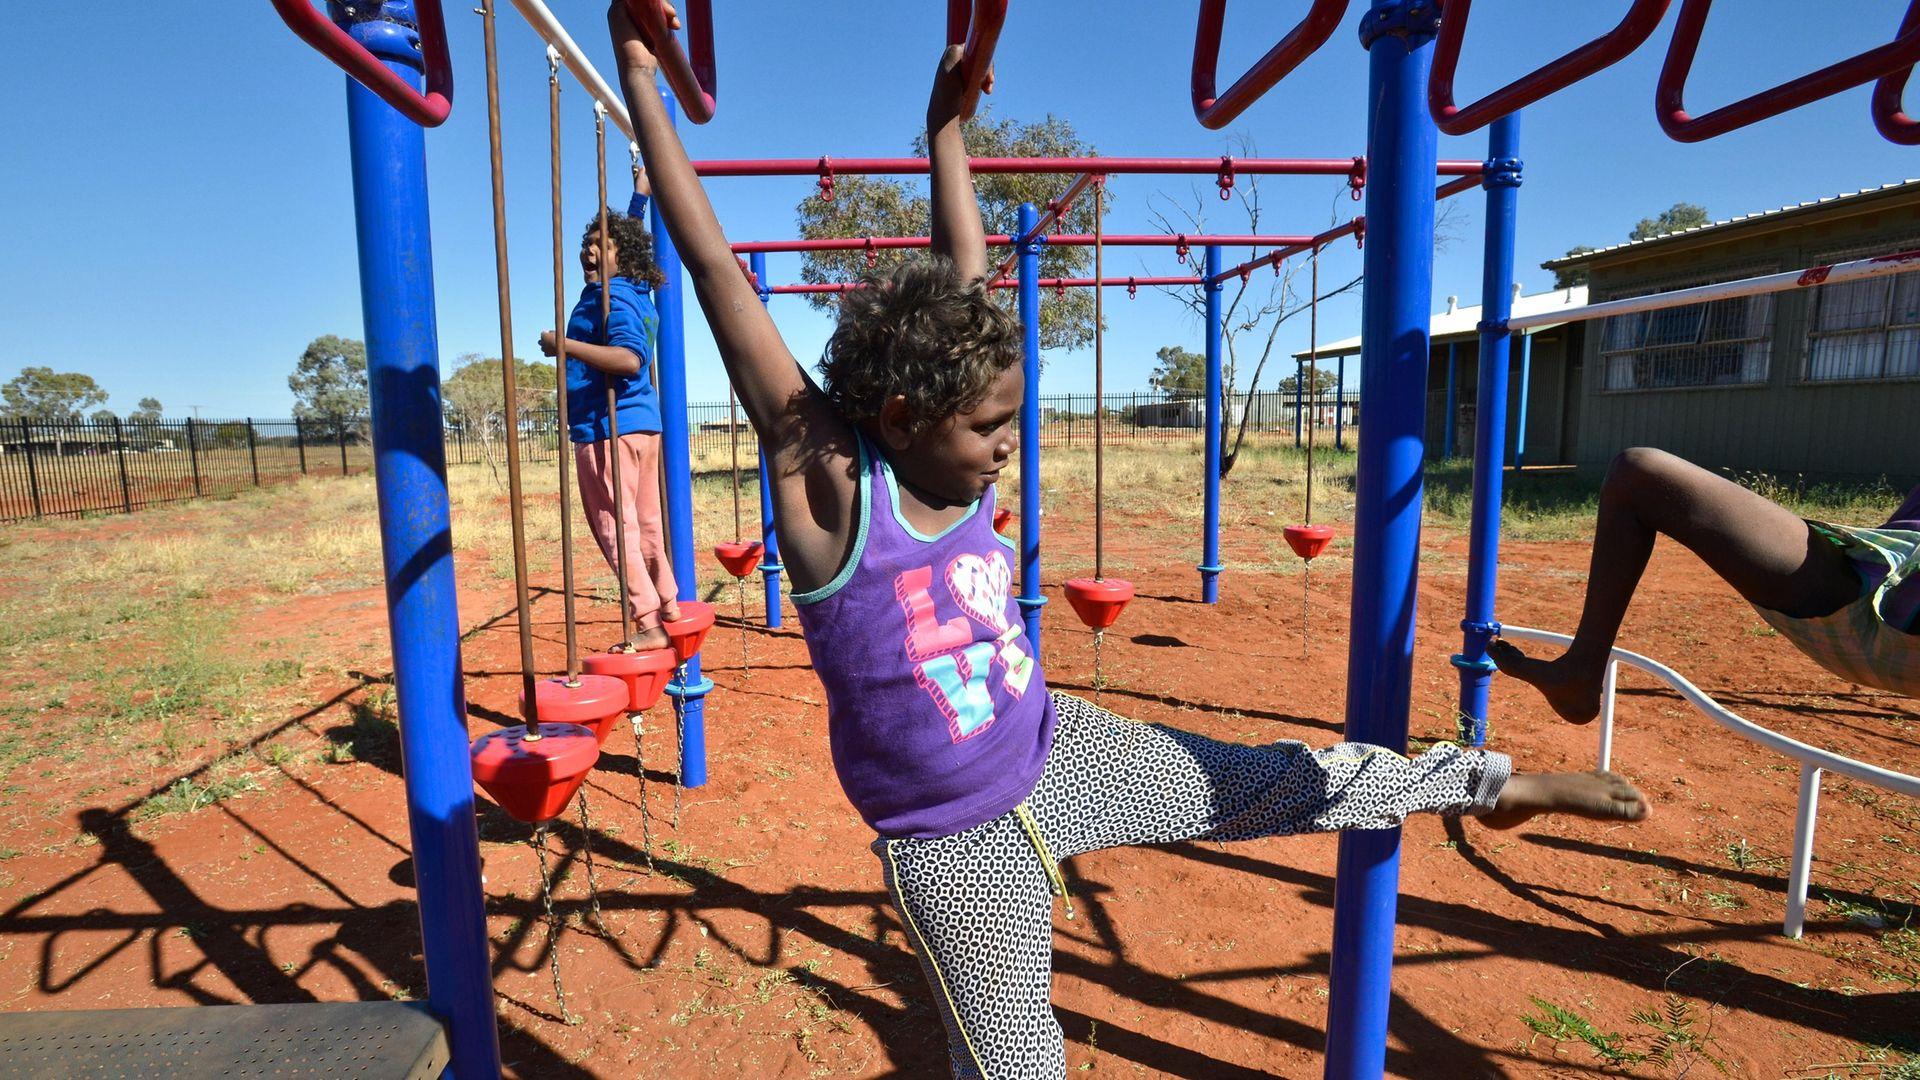 Schoolchildren play in the Anangu Pitjantjatjara Yankunytjatjara lands, in South Australia, where Pitjantjatjara is spoken - Credit: Fairfax Media via Getty Images